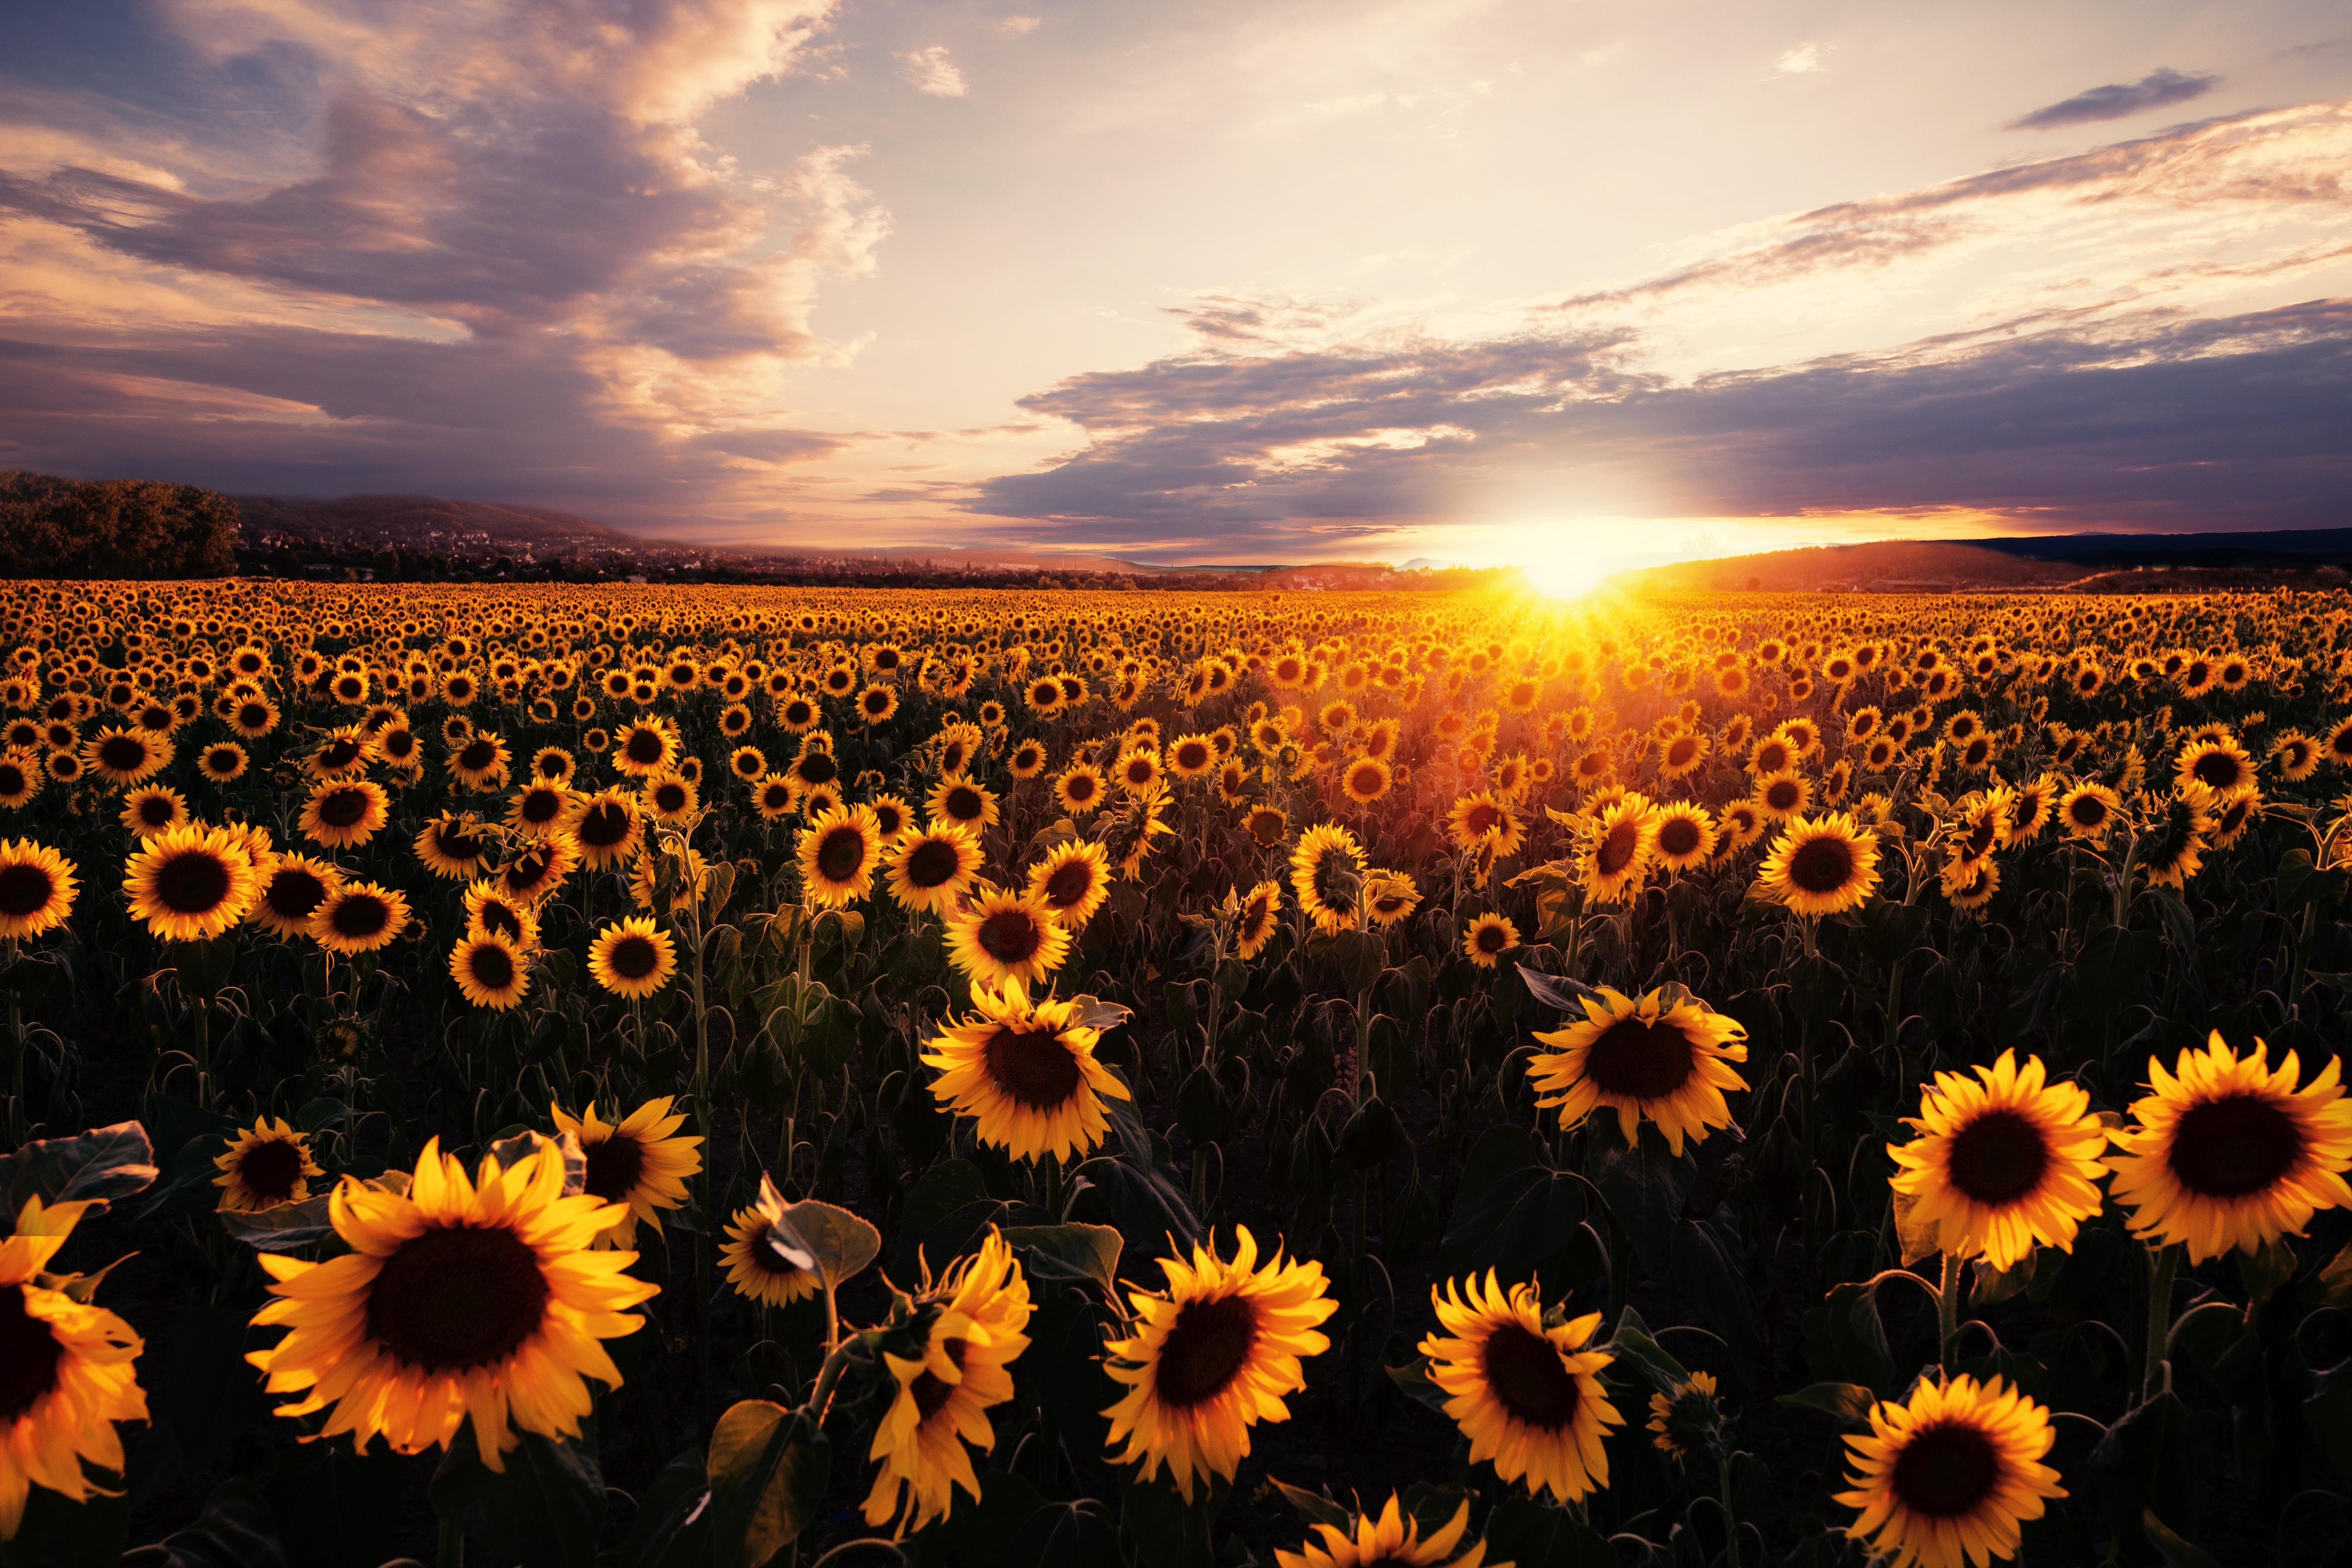 sunflowers field sunrise 4k 1629229650 - Sunflowers Field Sunrise 4k - Sunflowers Field Sunrise wallpapers, Sunflowers Field Sunrise 4k wallpapers